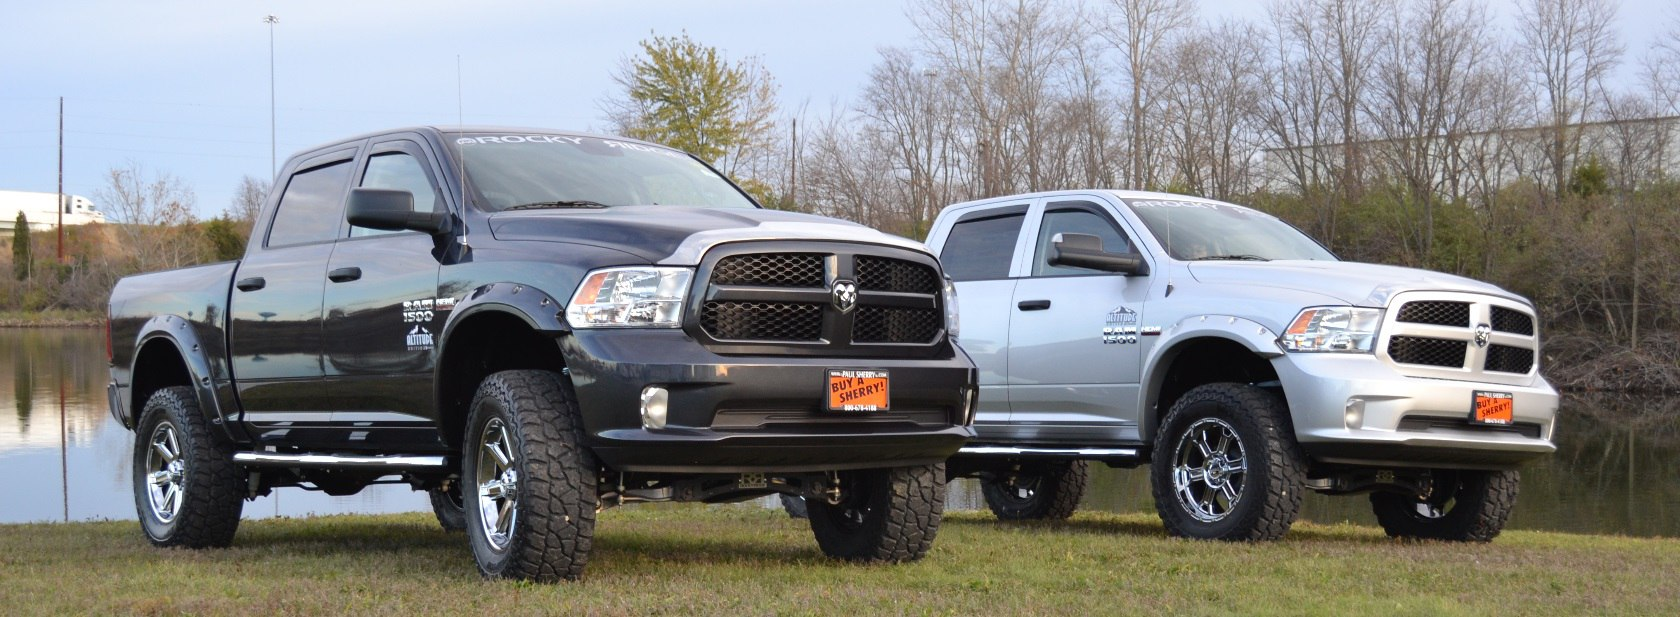 Cheap trucks for sale in ohio